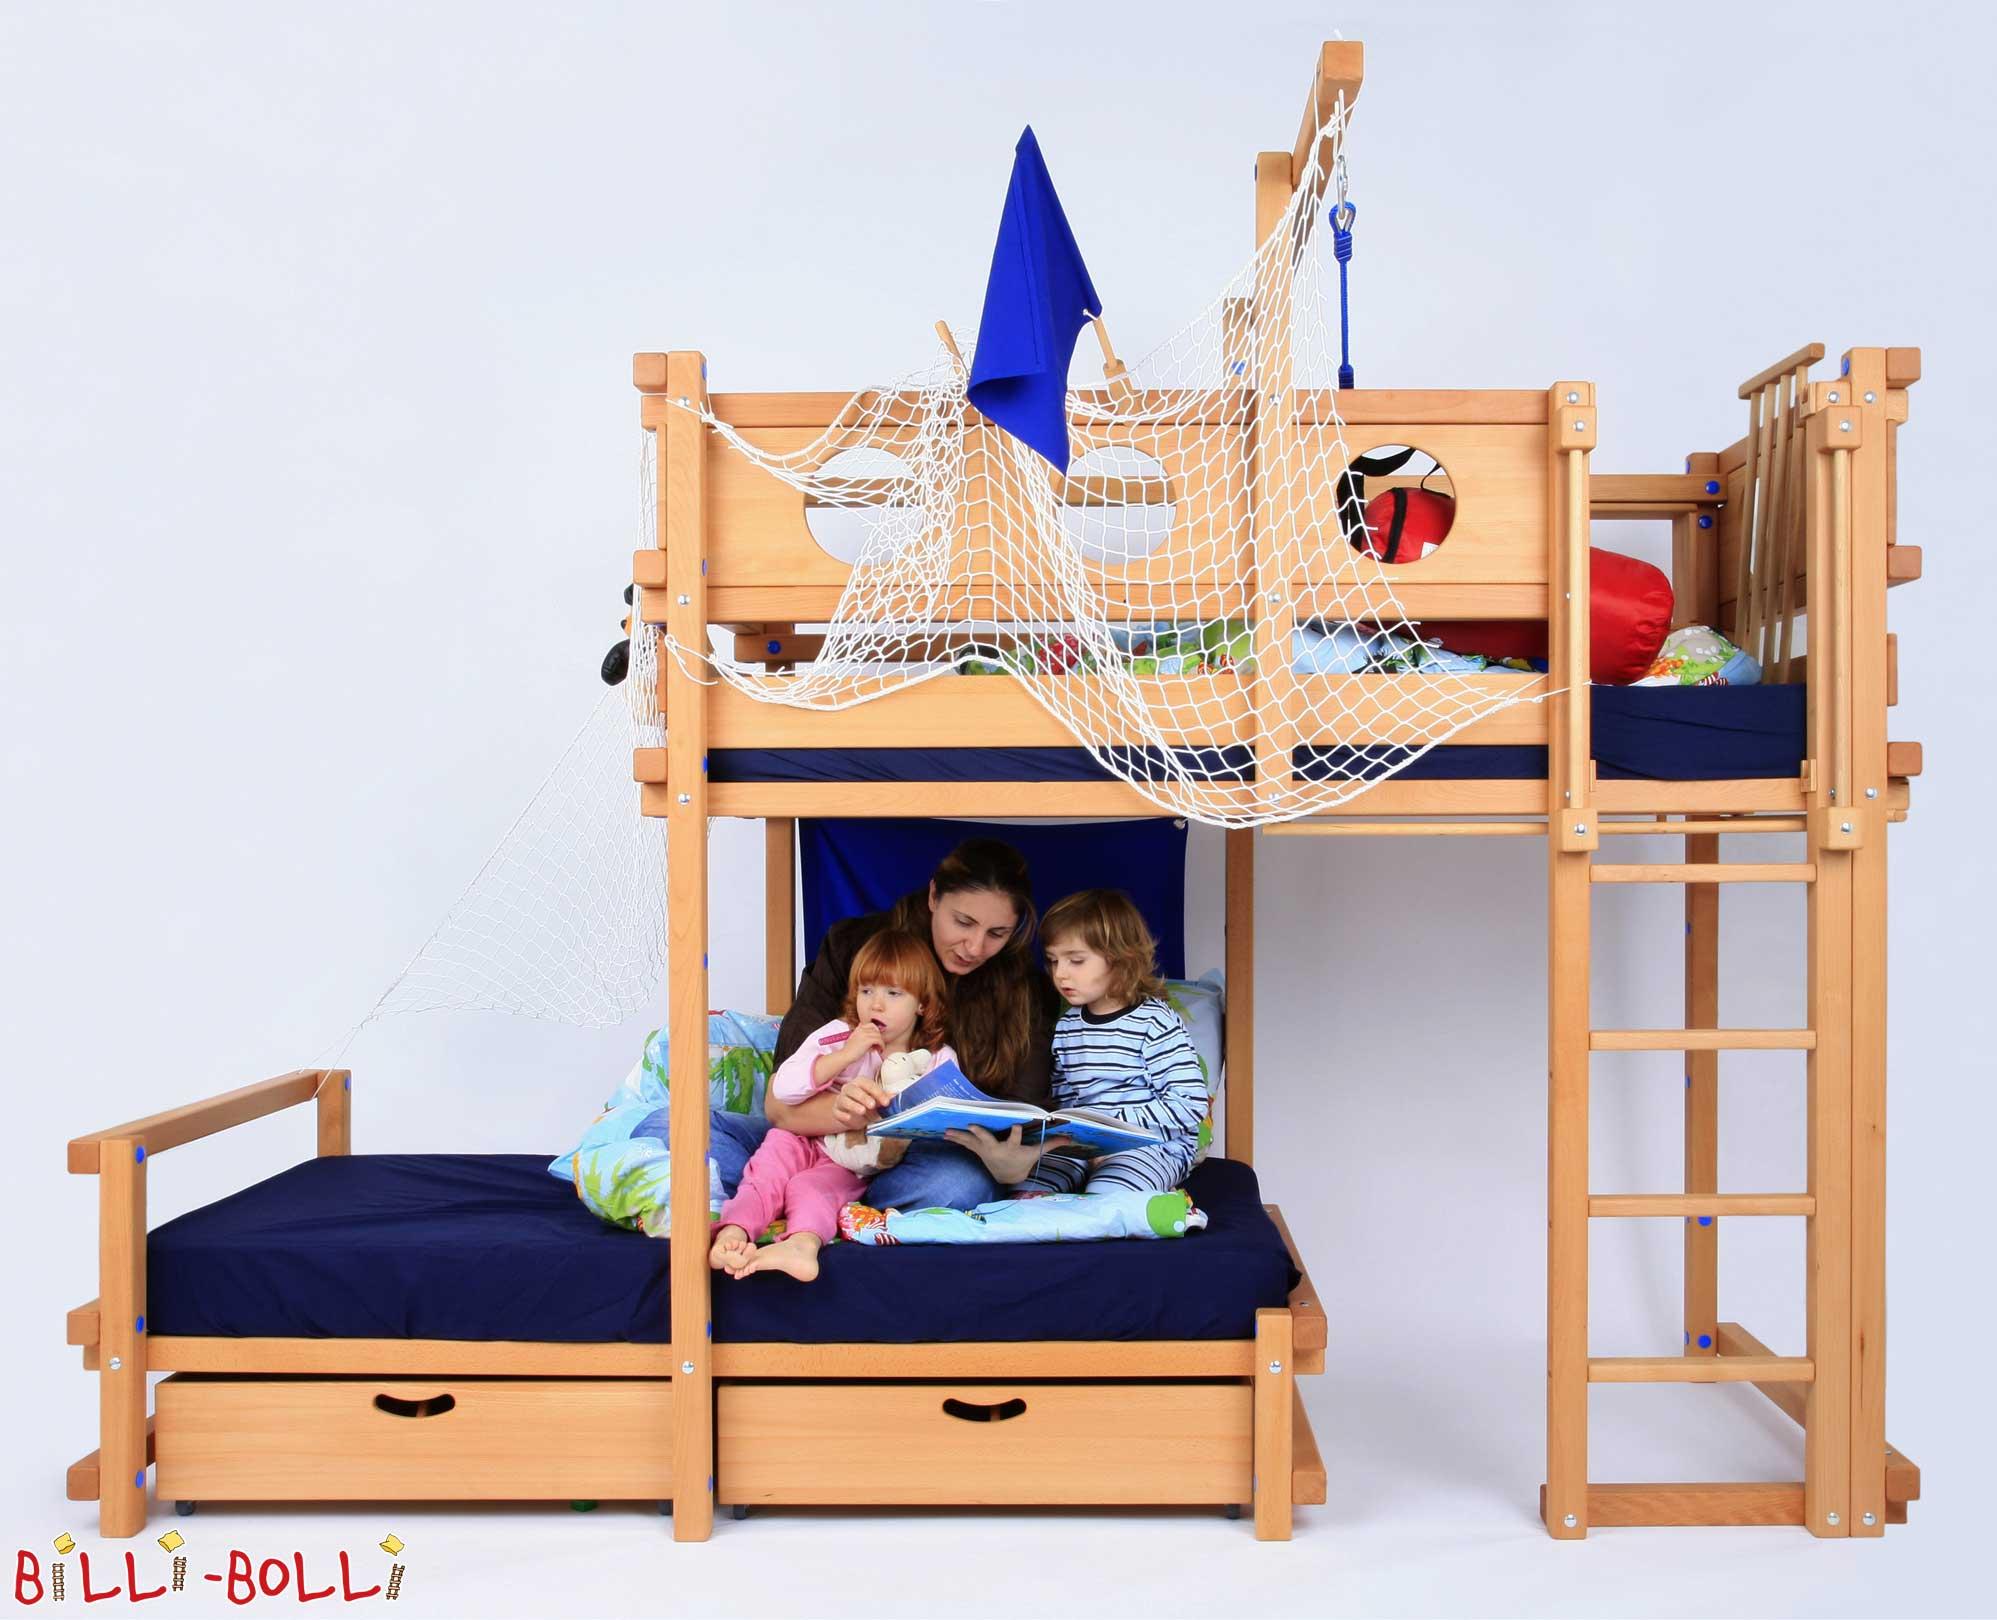 etagenbett seitlich versetzt billi bolli kinderm bel. Black Bedroom Furniture Sets. Home Design Ideas